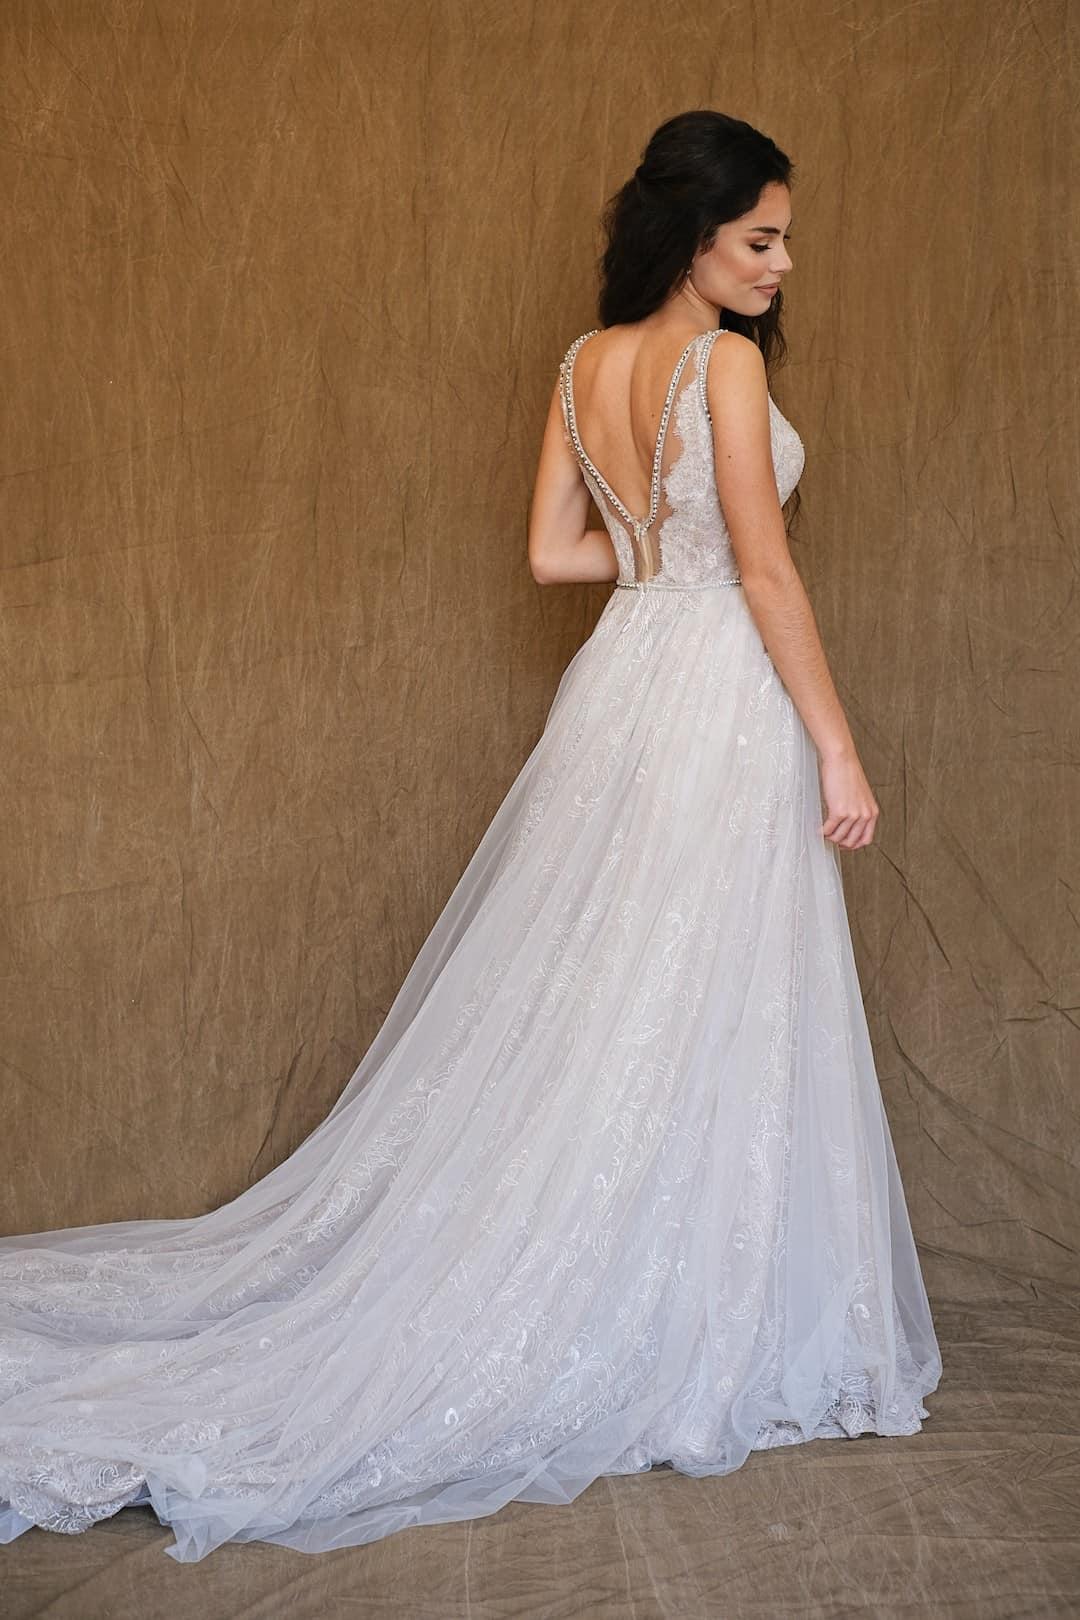 Wedding dresses on sale in Bratislava - Galia Lahav - Gala 711 - back